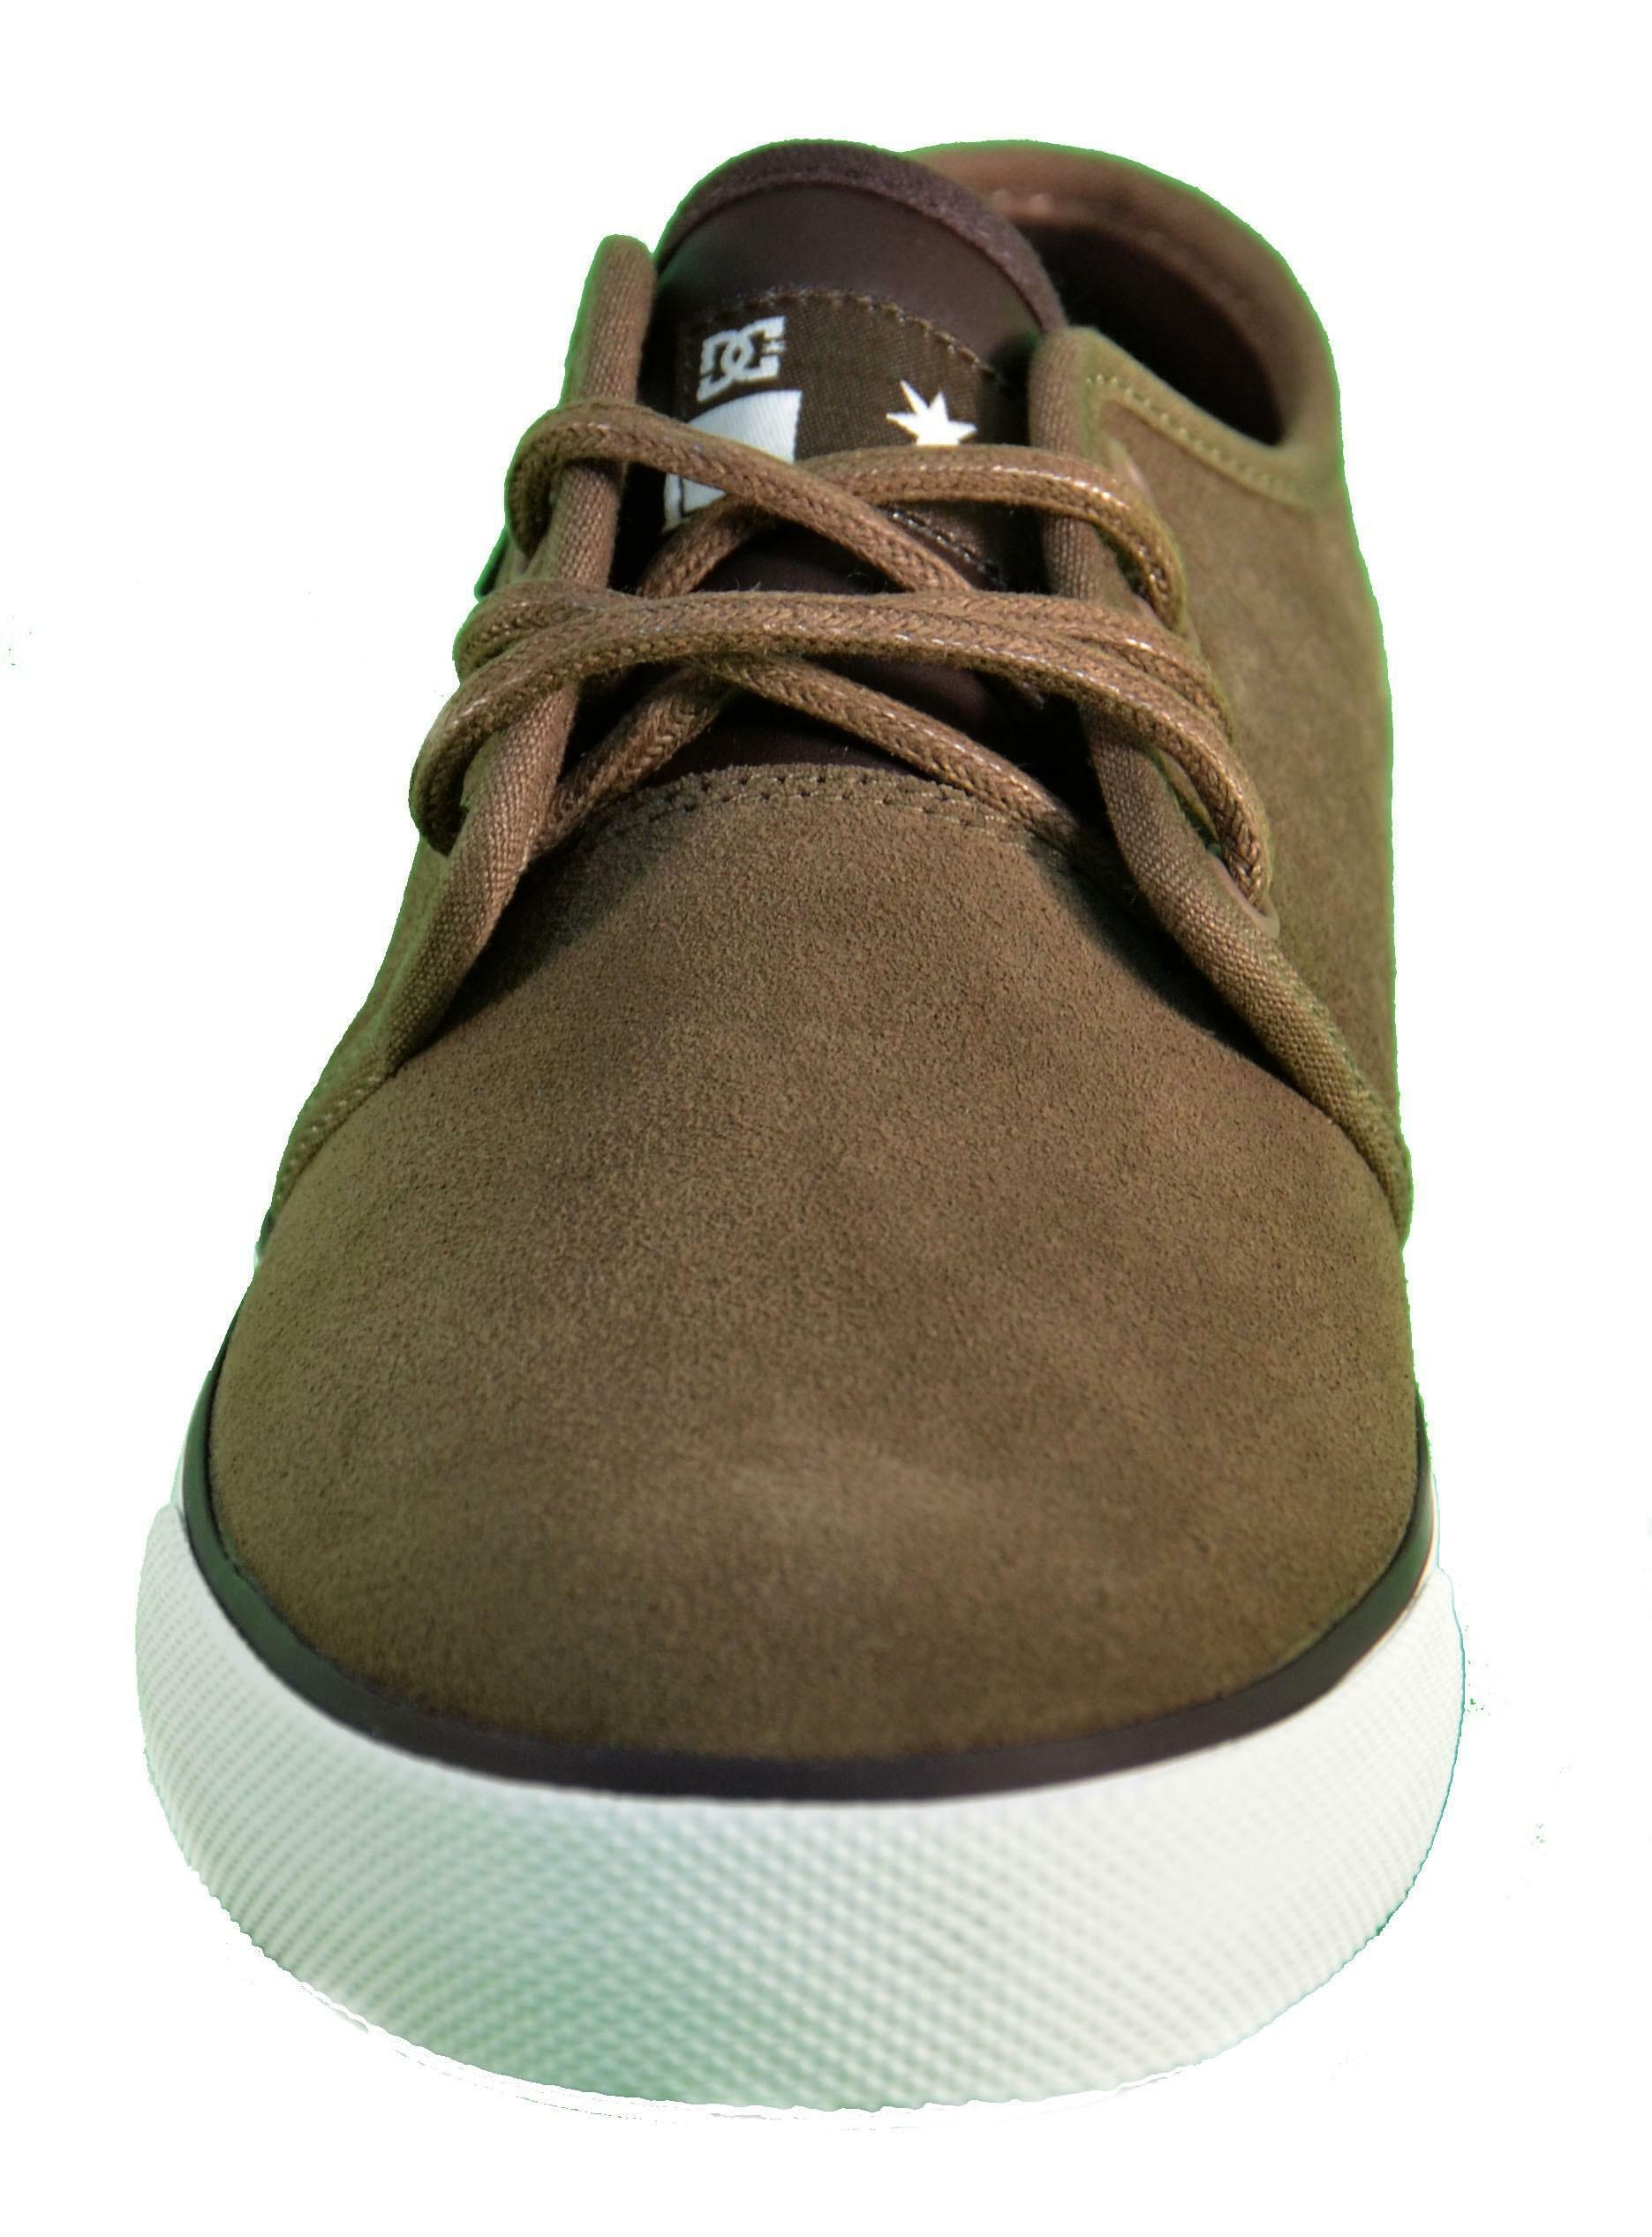 dc dc shoes studio s scarpe marroni pelle 303284